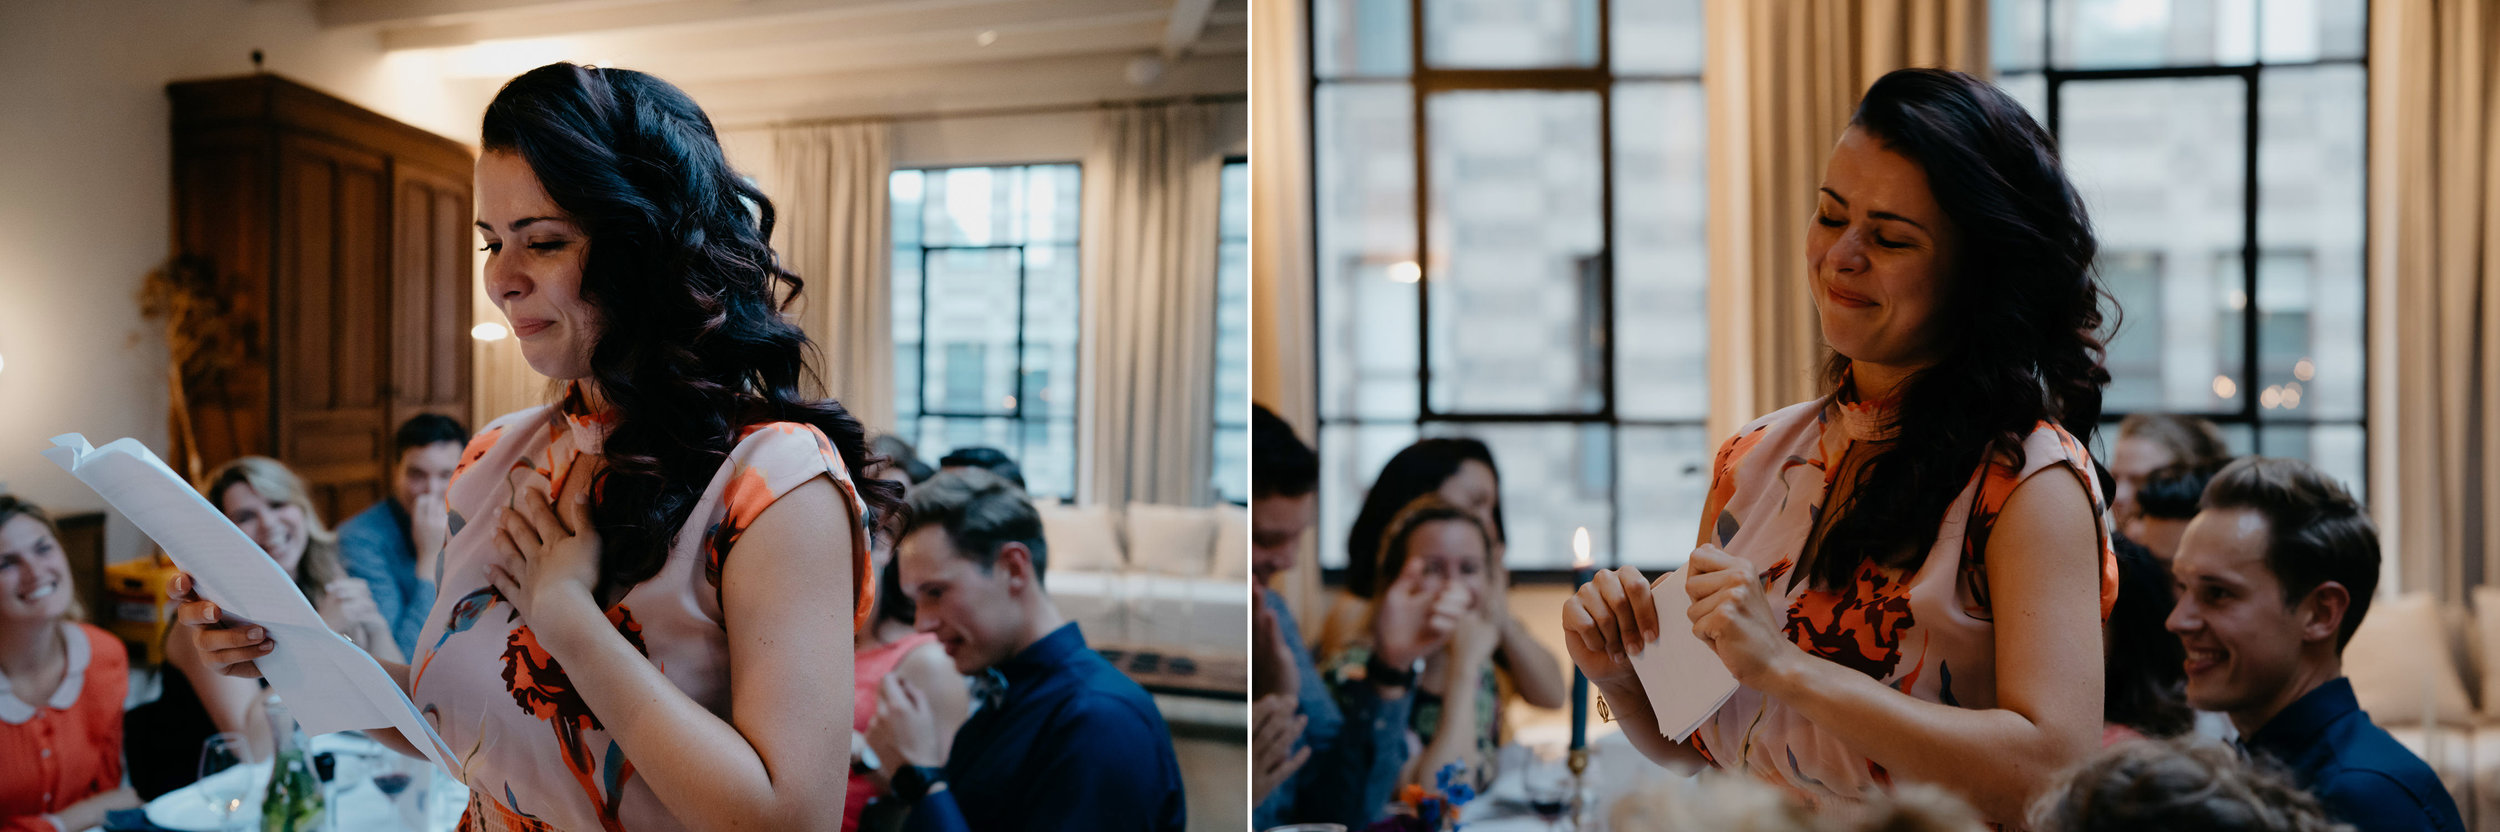 Emotional wedding speech mark hadden photography